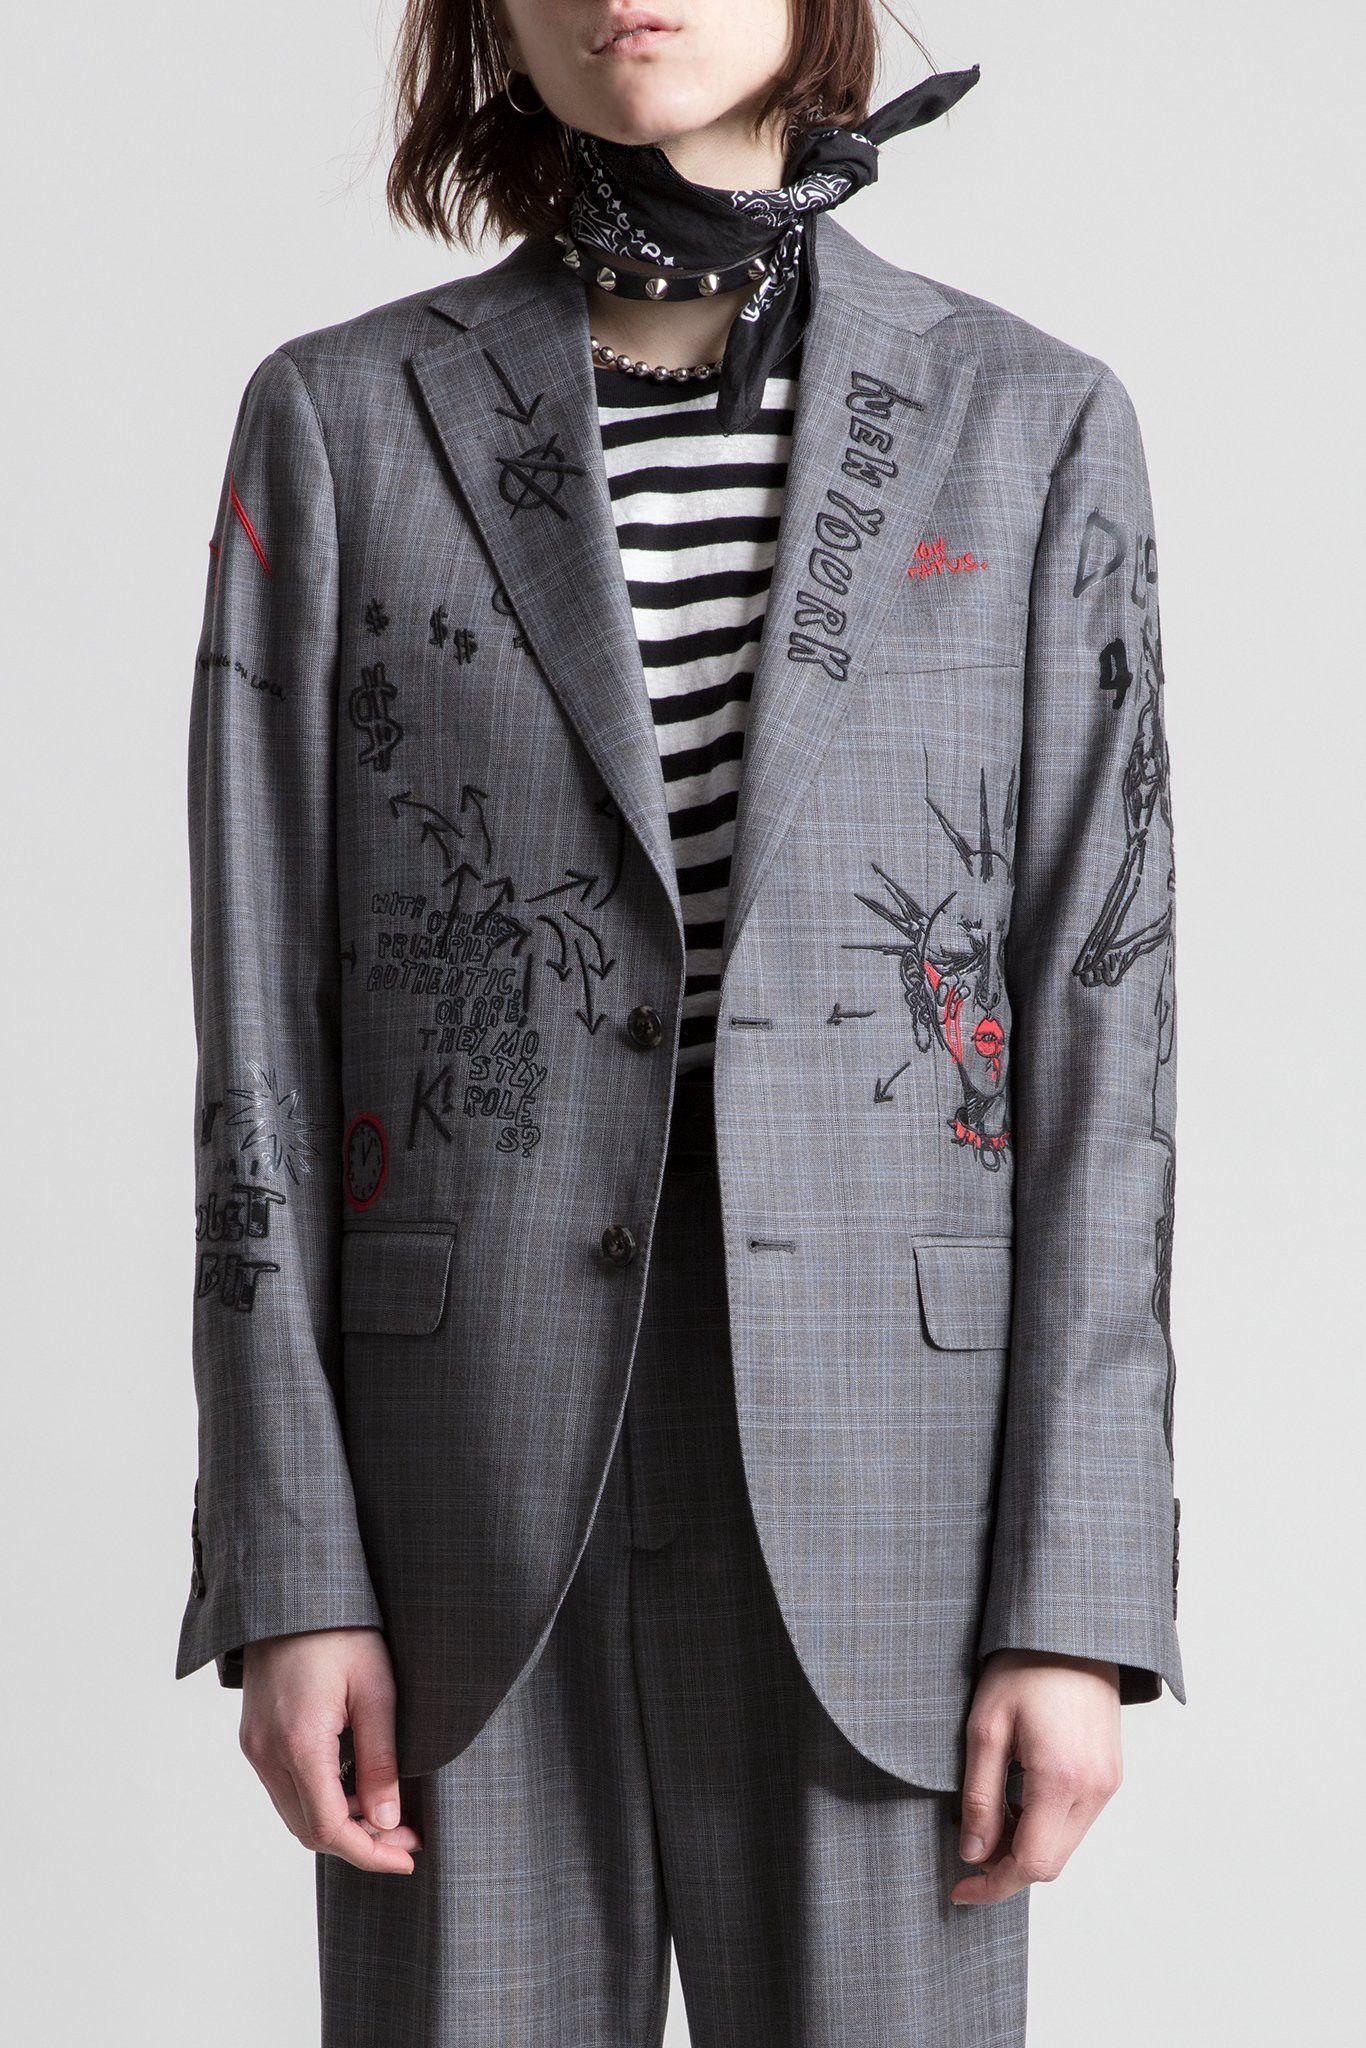 R13 Embroidered Graphic Sport Blazer - L Grey